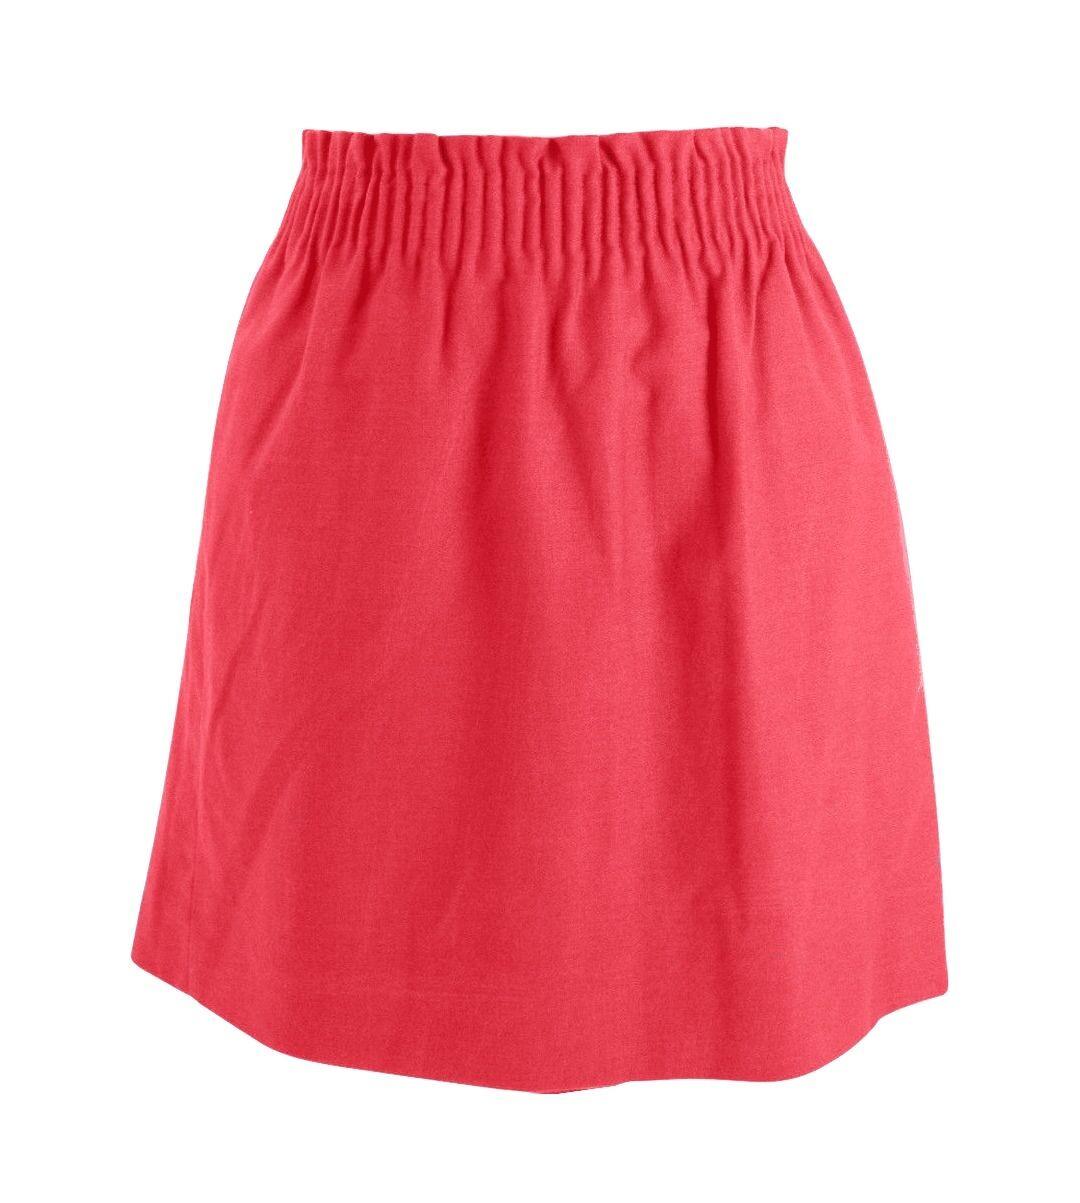 J Crew Factory - Womens 0 (XS) - Coral Linen Cotton Sidewalk Pull-on Mini Skirt